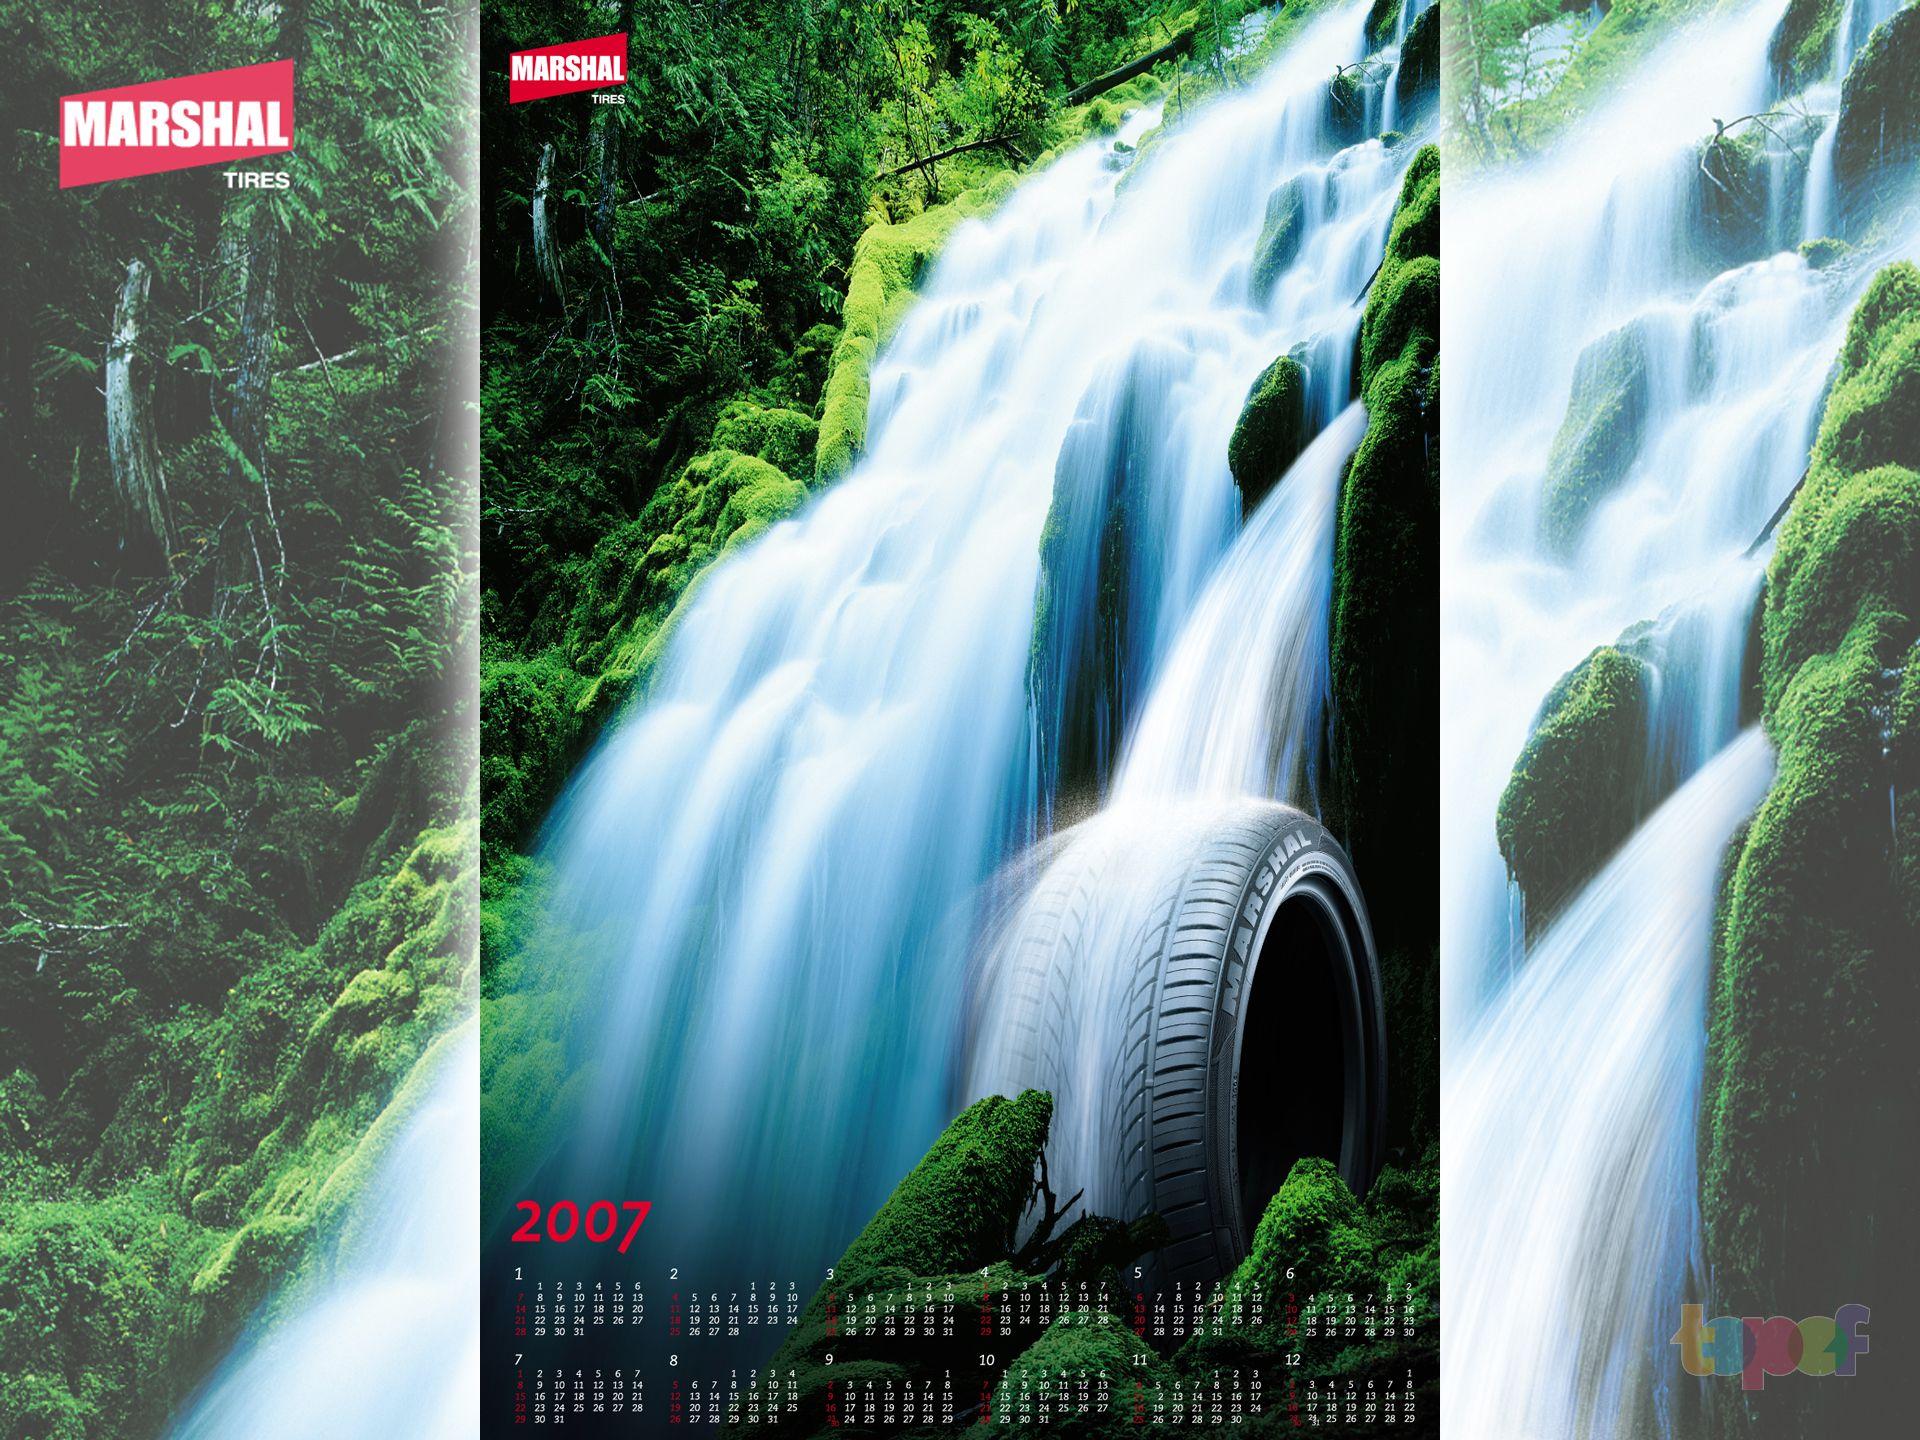 Календари от Marshal (Шины). 2007 год